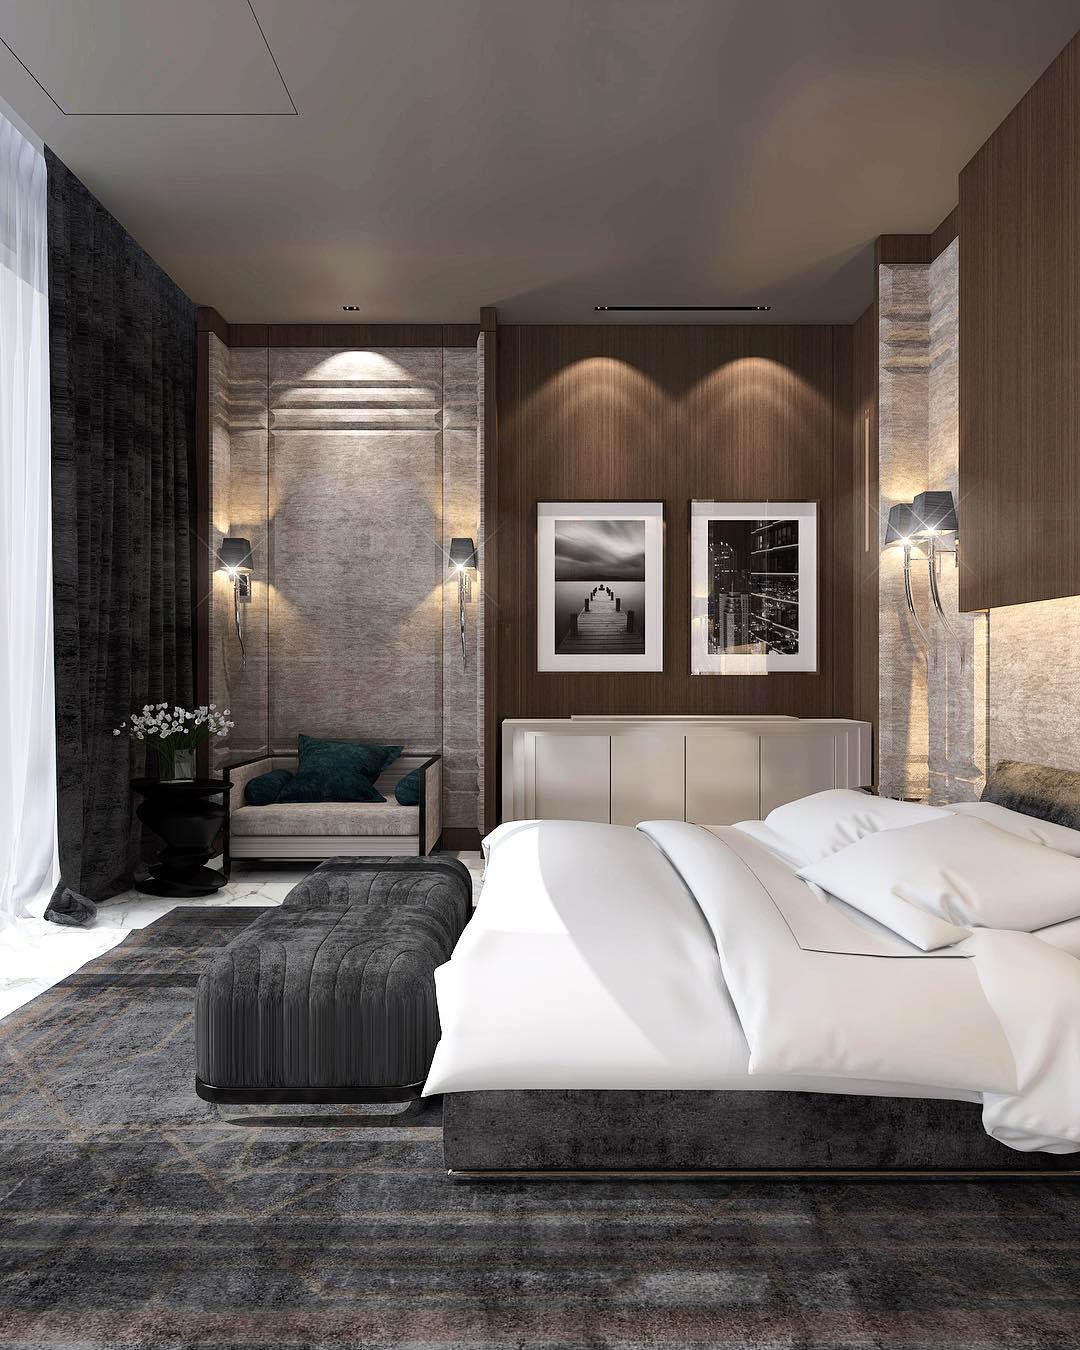 Constantin Frolov Interior Design   Luxurious Bedroom Ideas